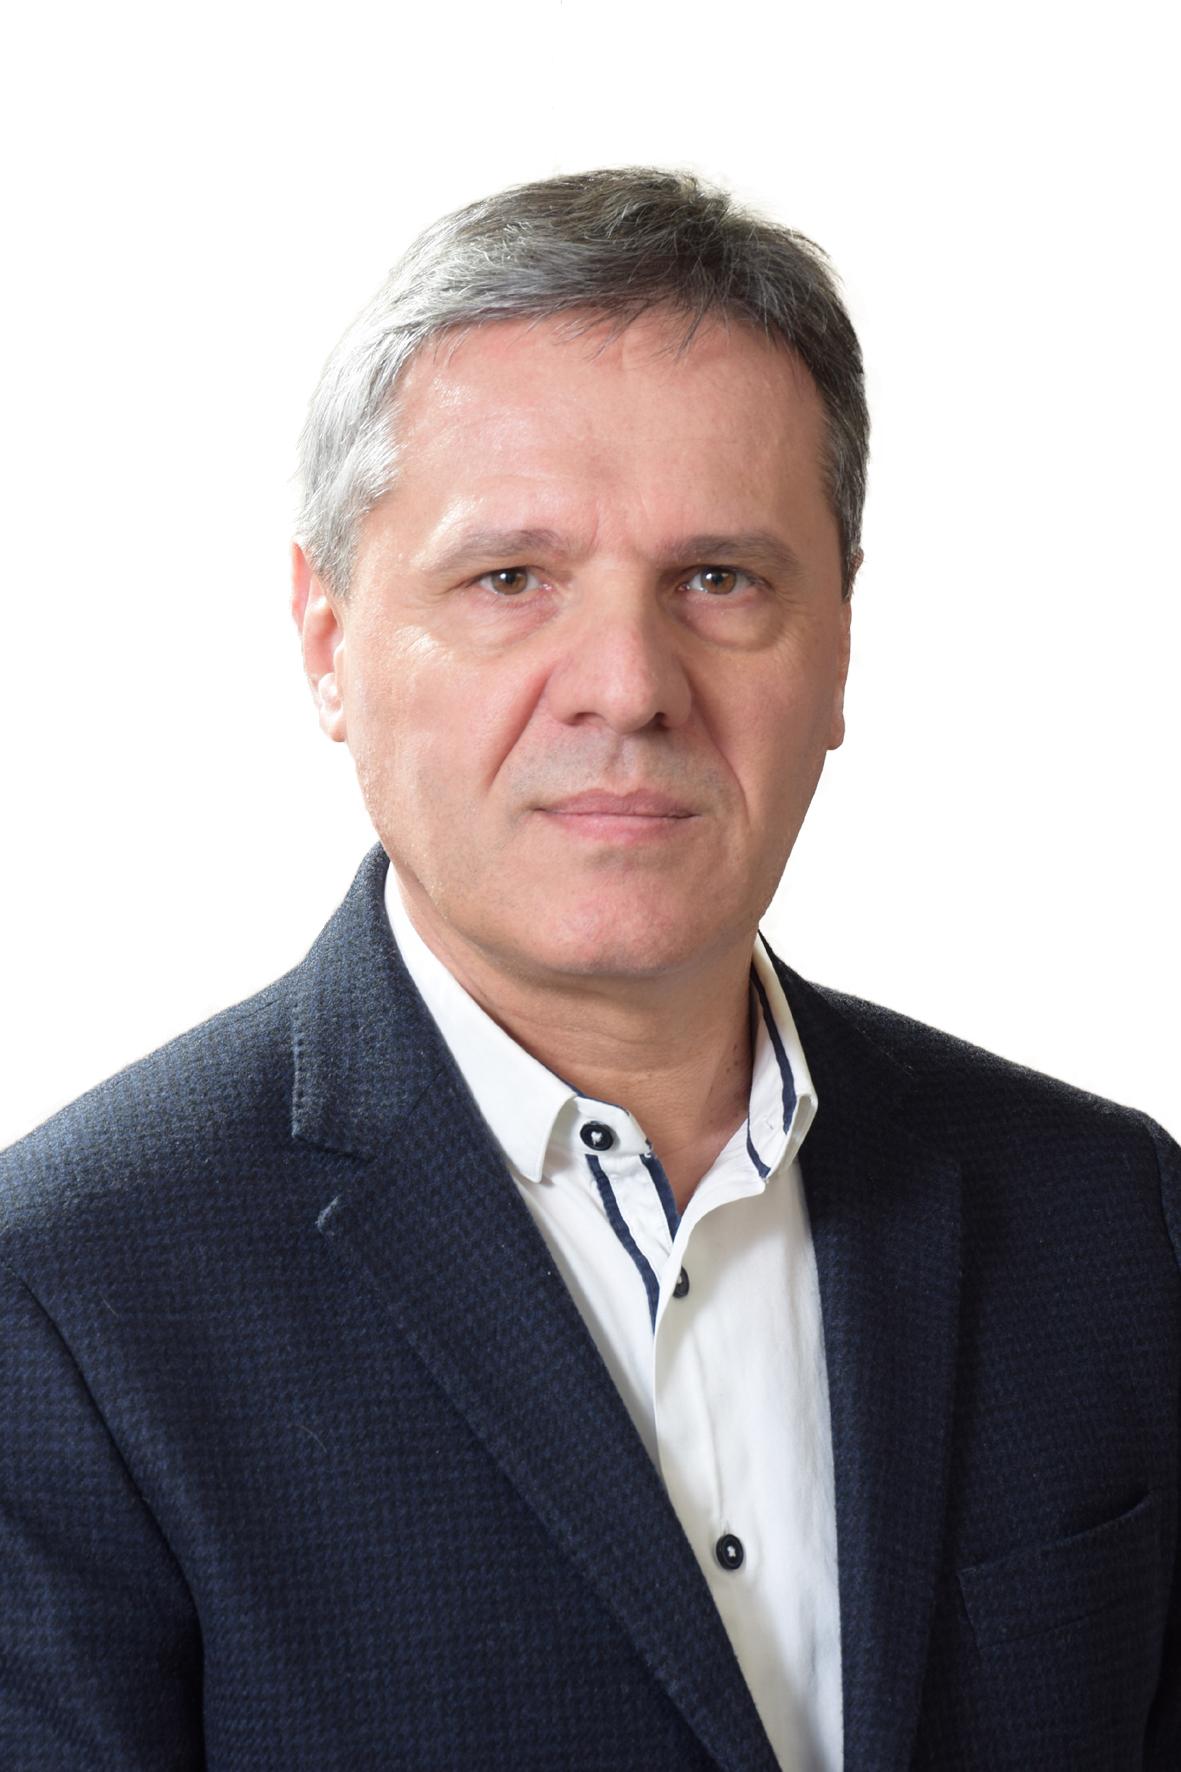 Italo Spalenza